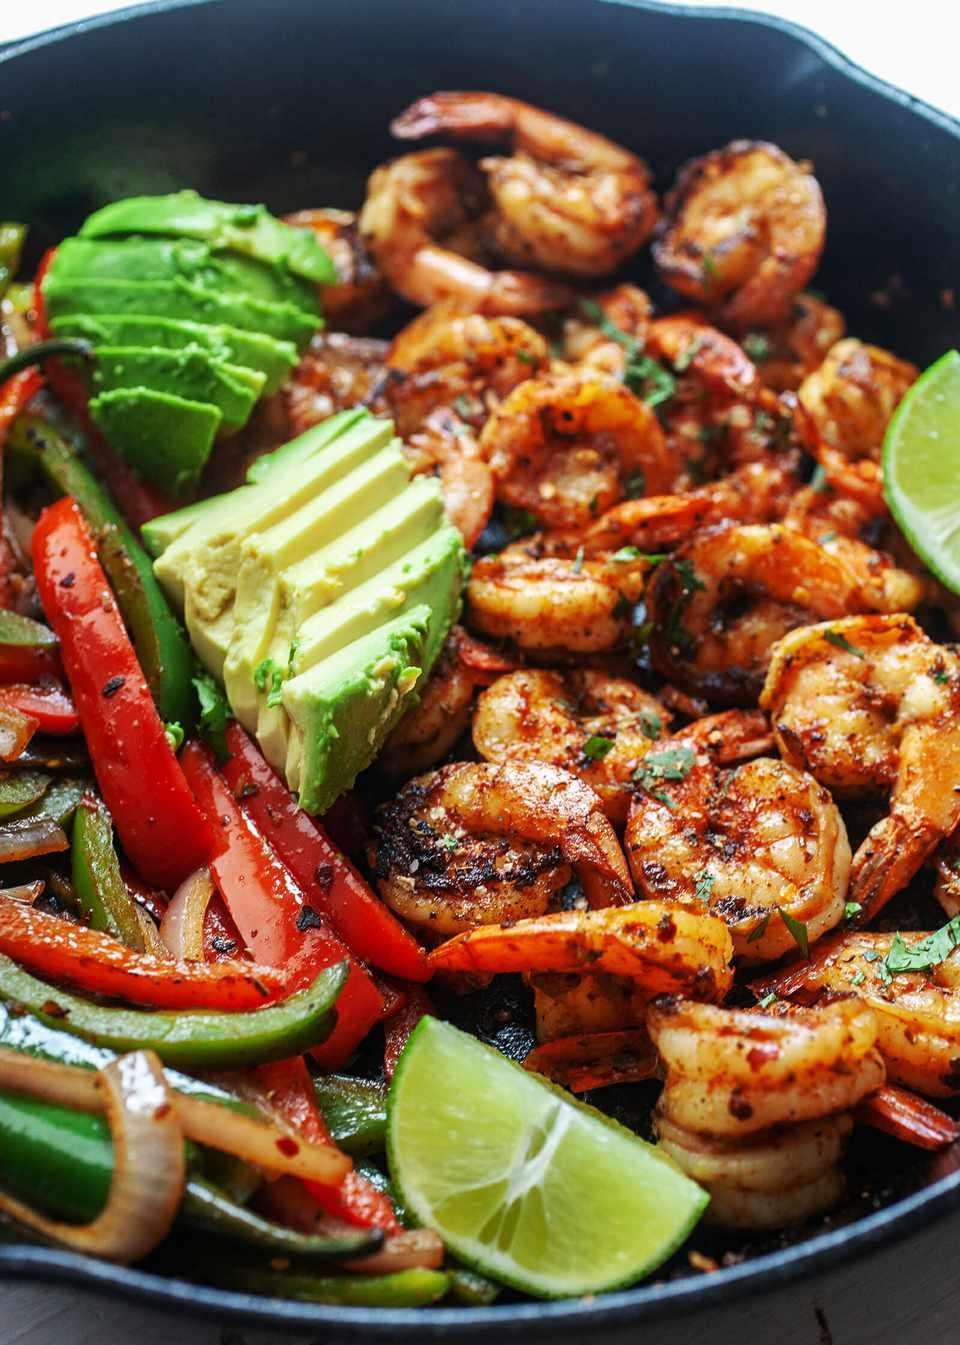 How to Make Shrimp Fajitas